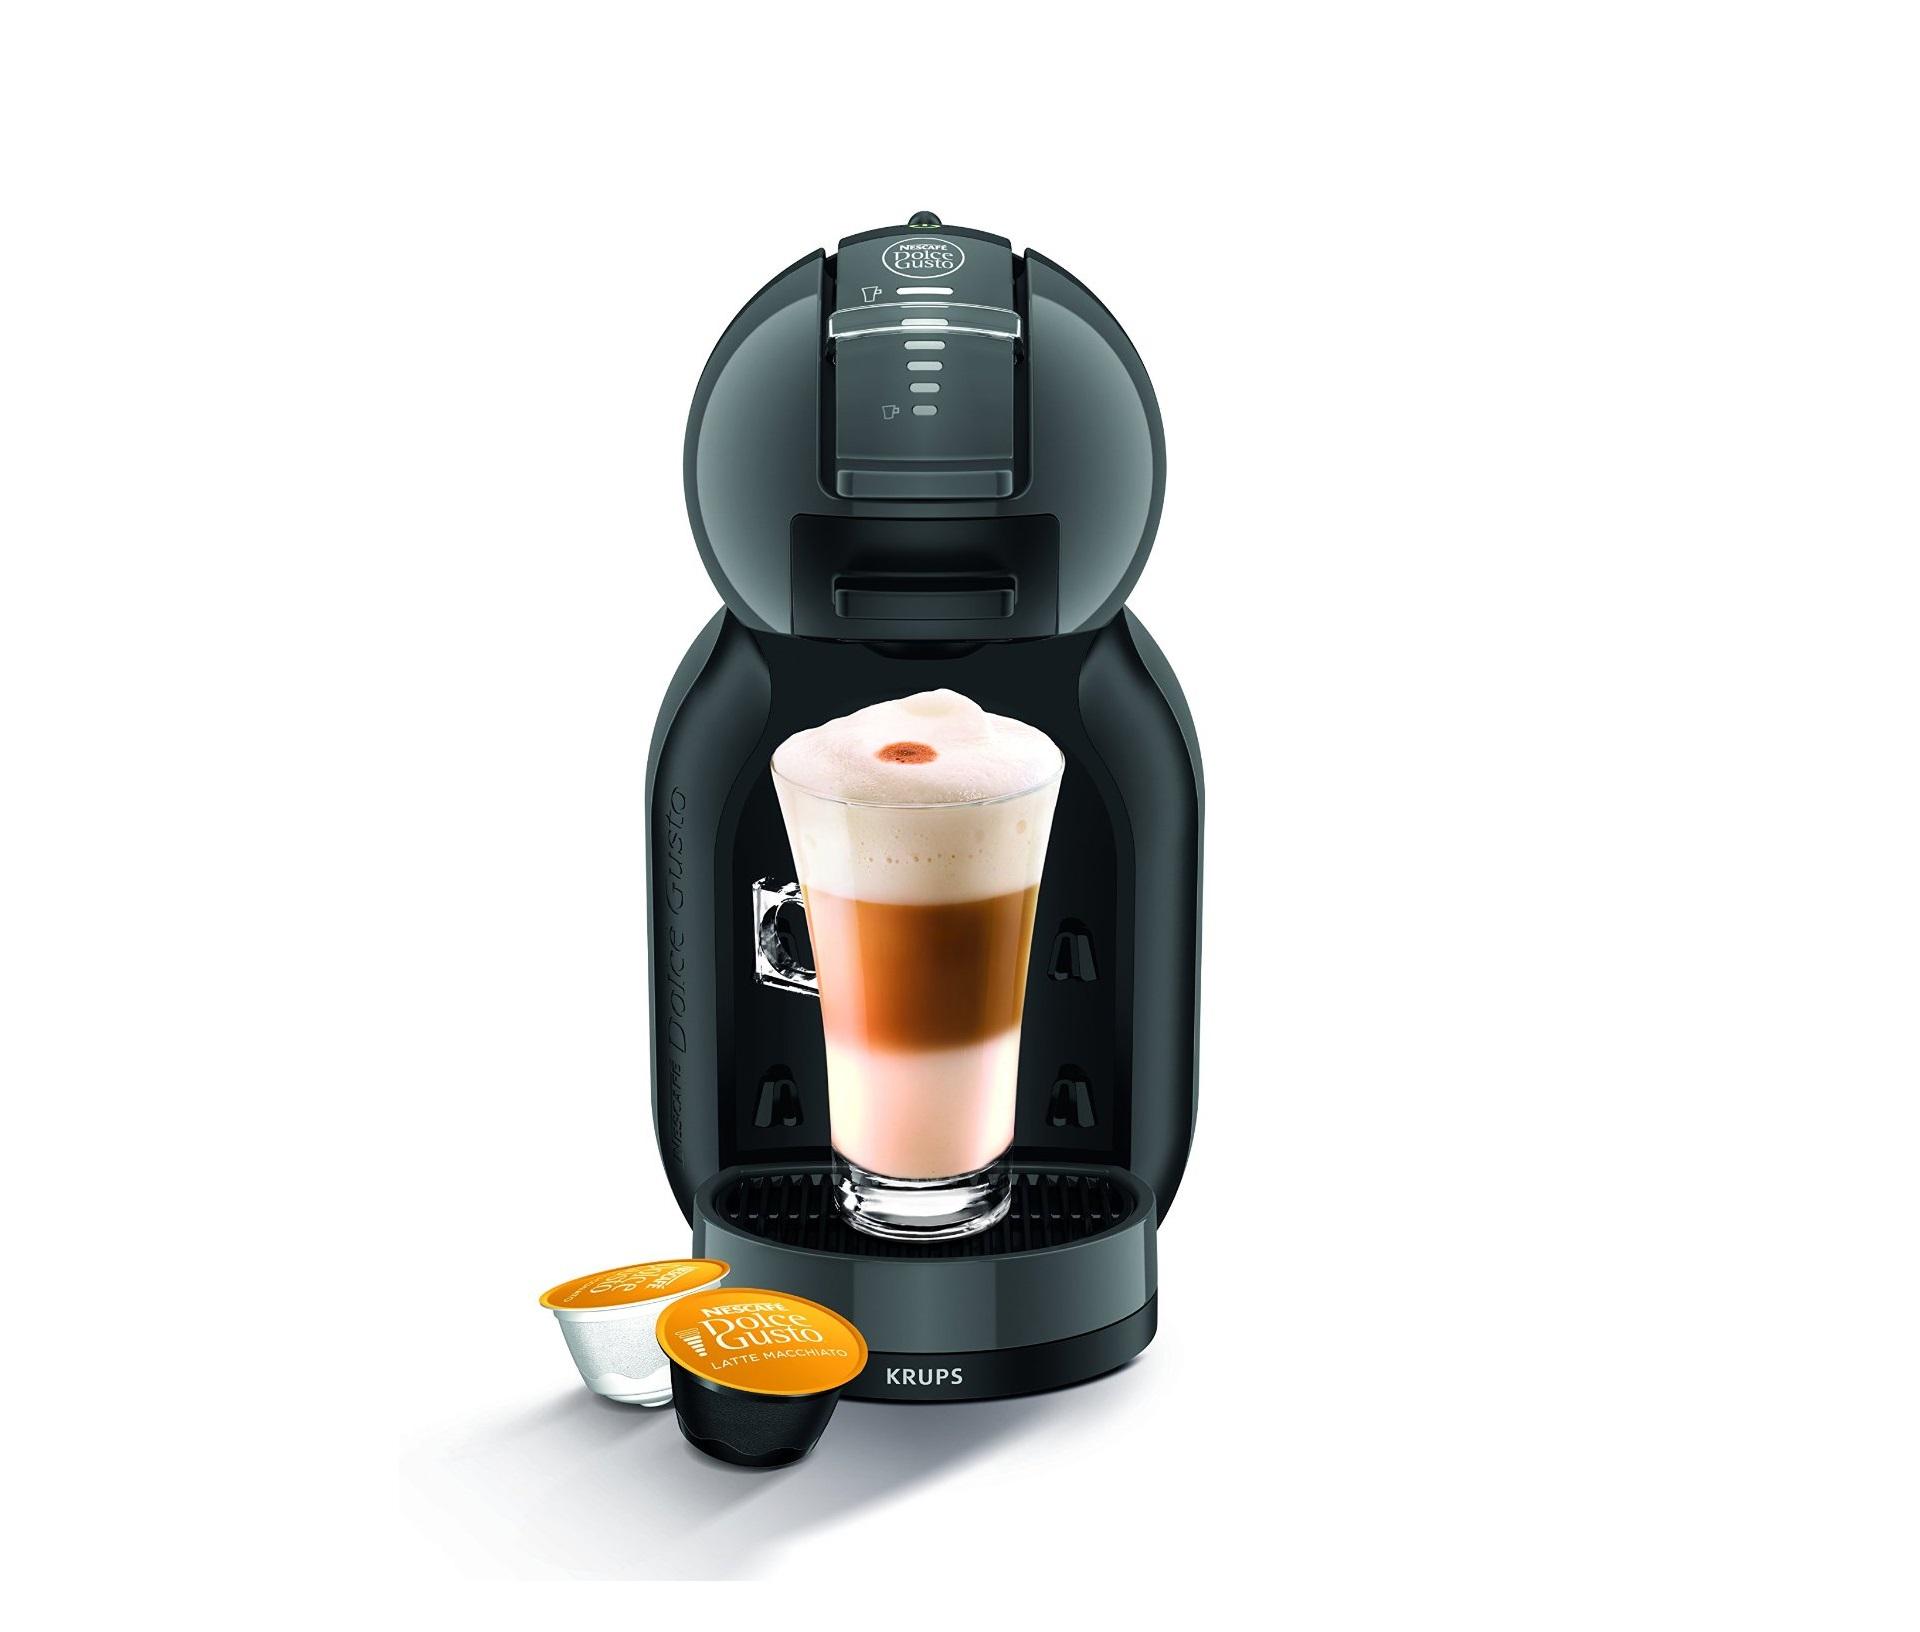 Krups-KP1208-Nescafé-Dolce-Gusto-Mini-Me-Automatisch-Anthrazit1 Dolce Gusto Mini Me